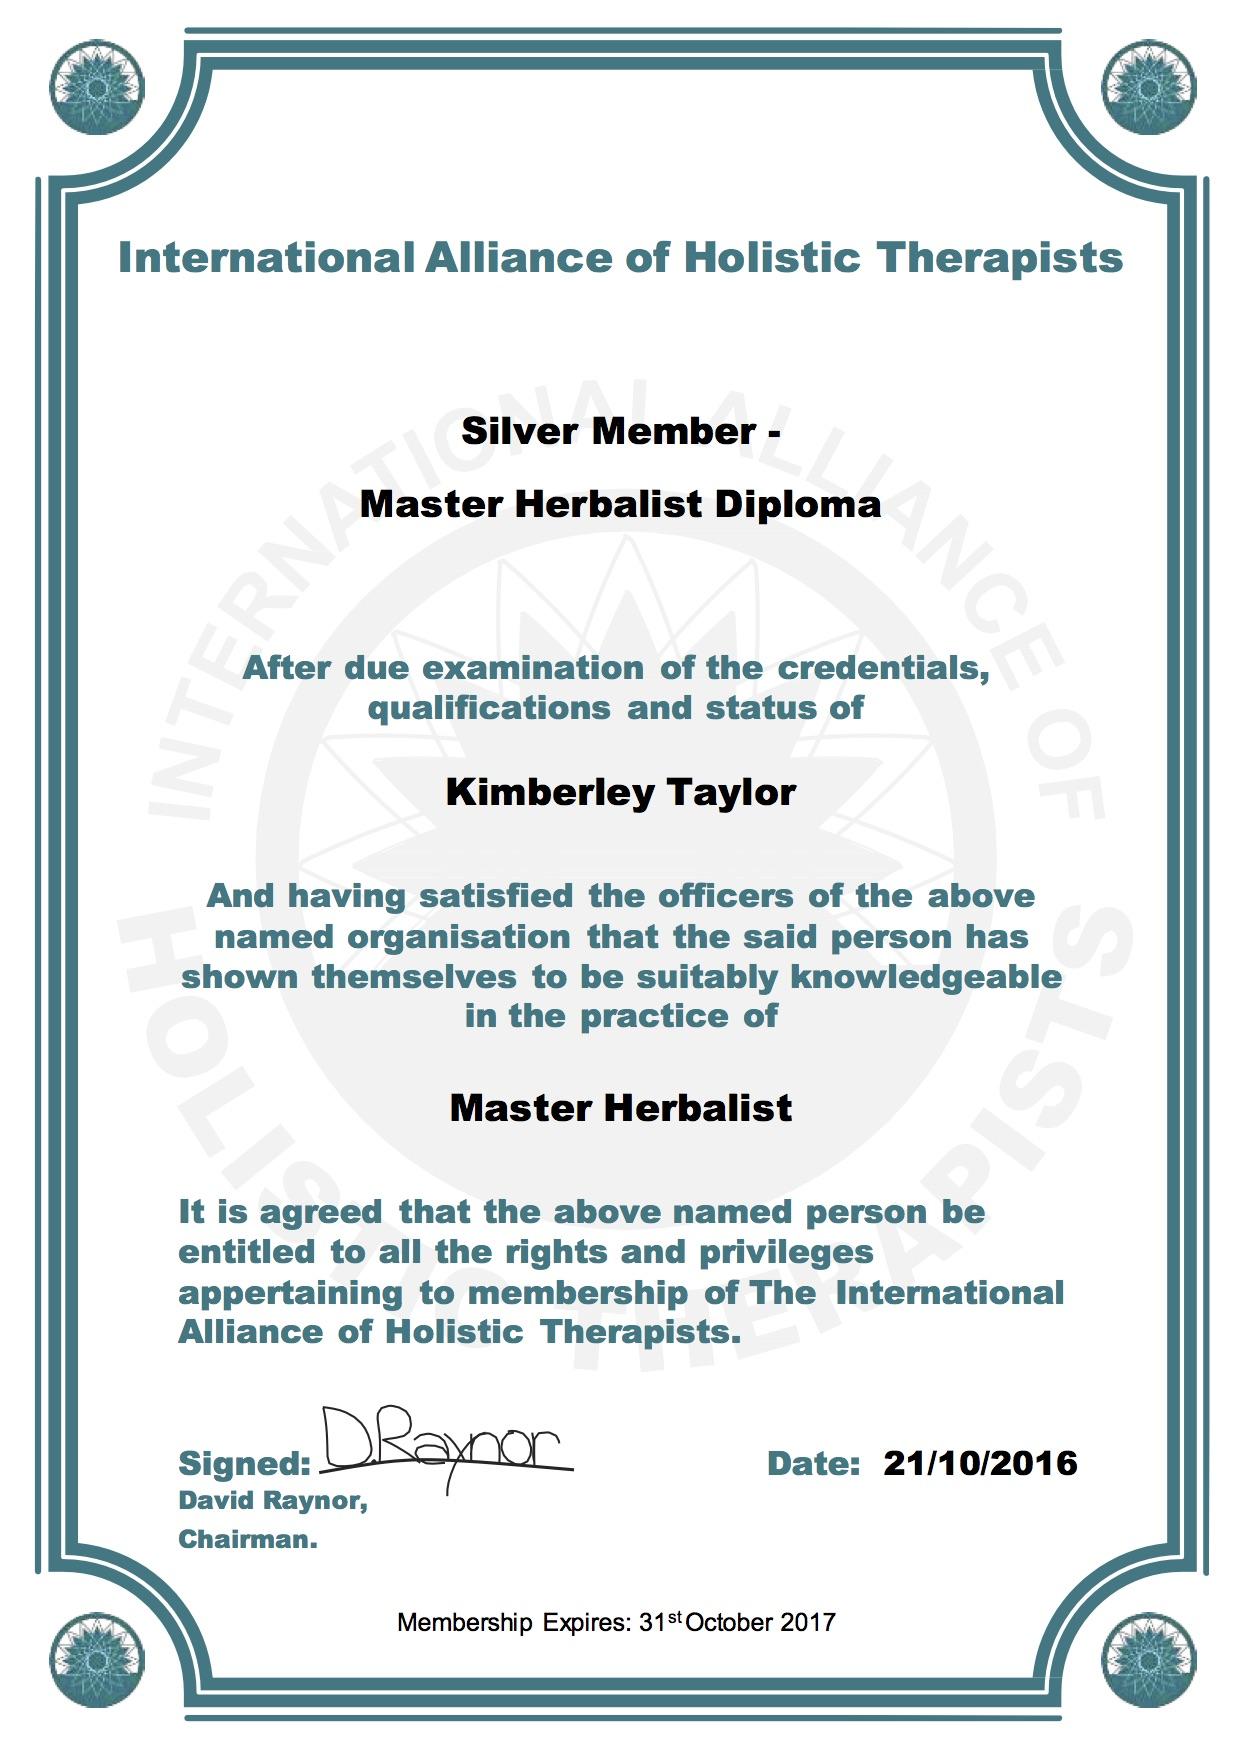 IAHT_Silver_Member_Master_Herbalist_Diploma_Kimberley_Taylor